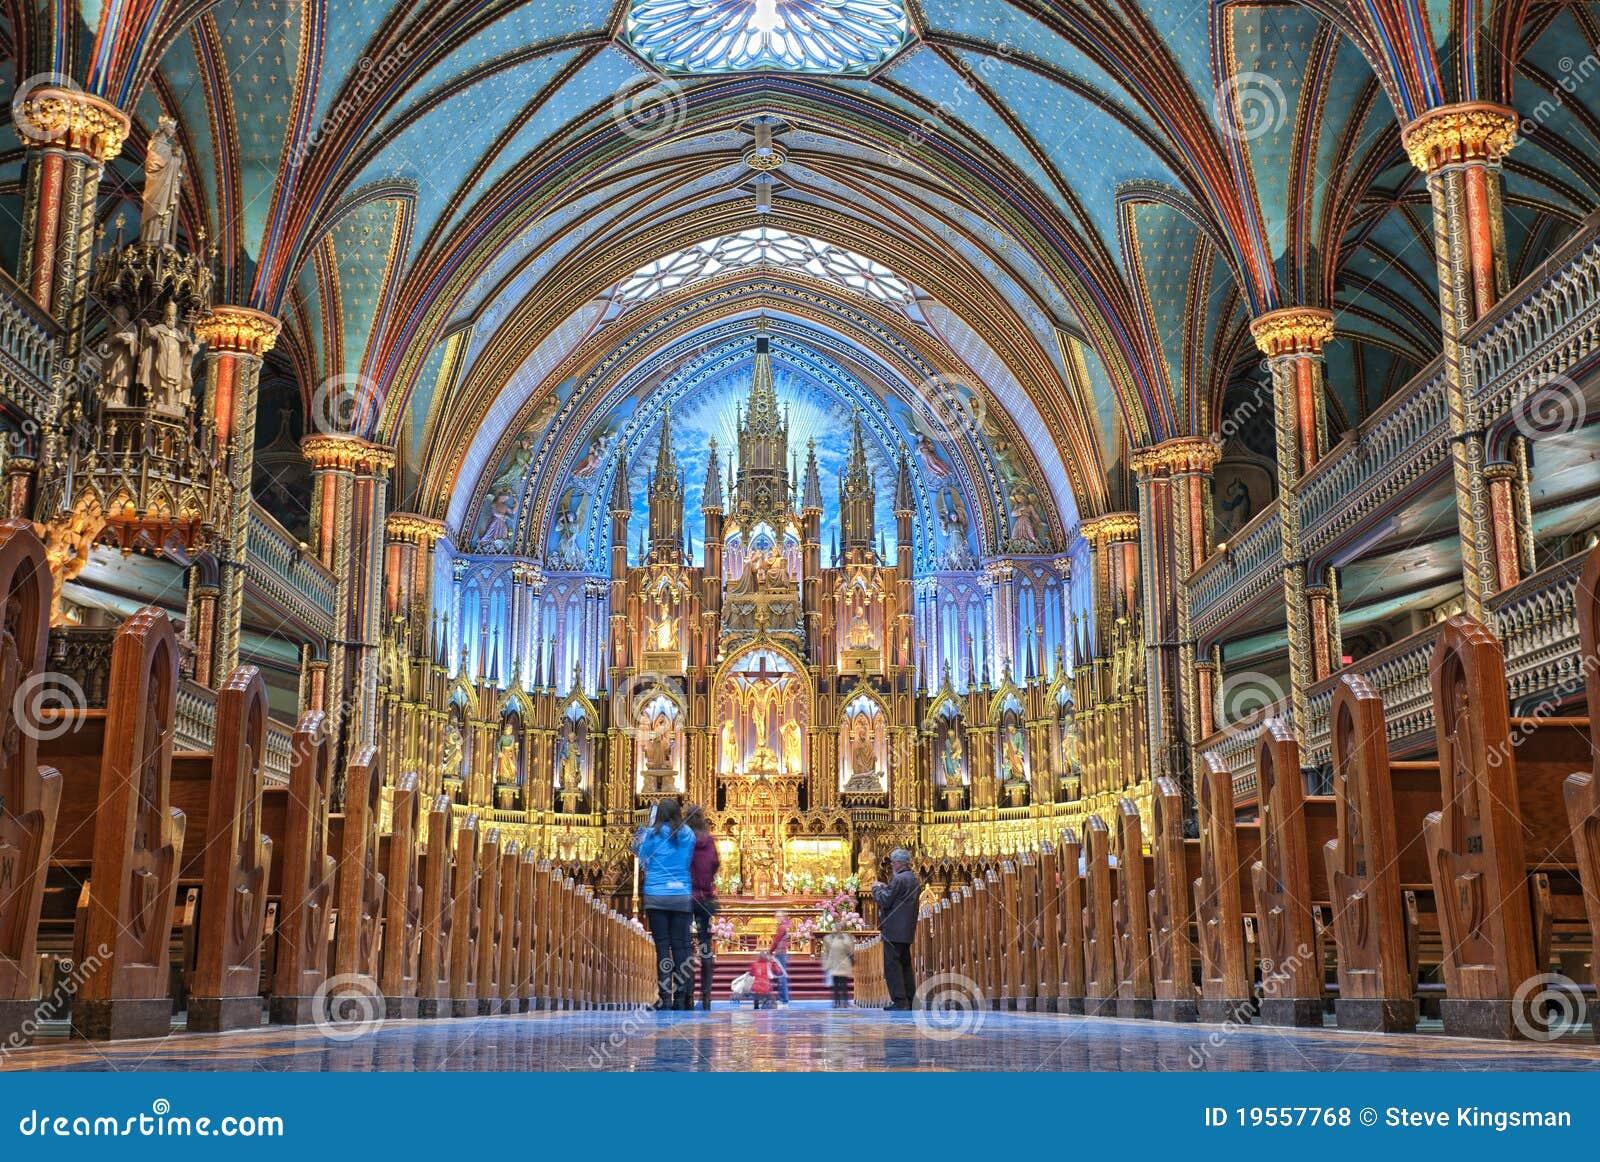 Notre Dame Basilica Royalty Free Stock Photos Image